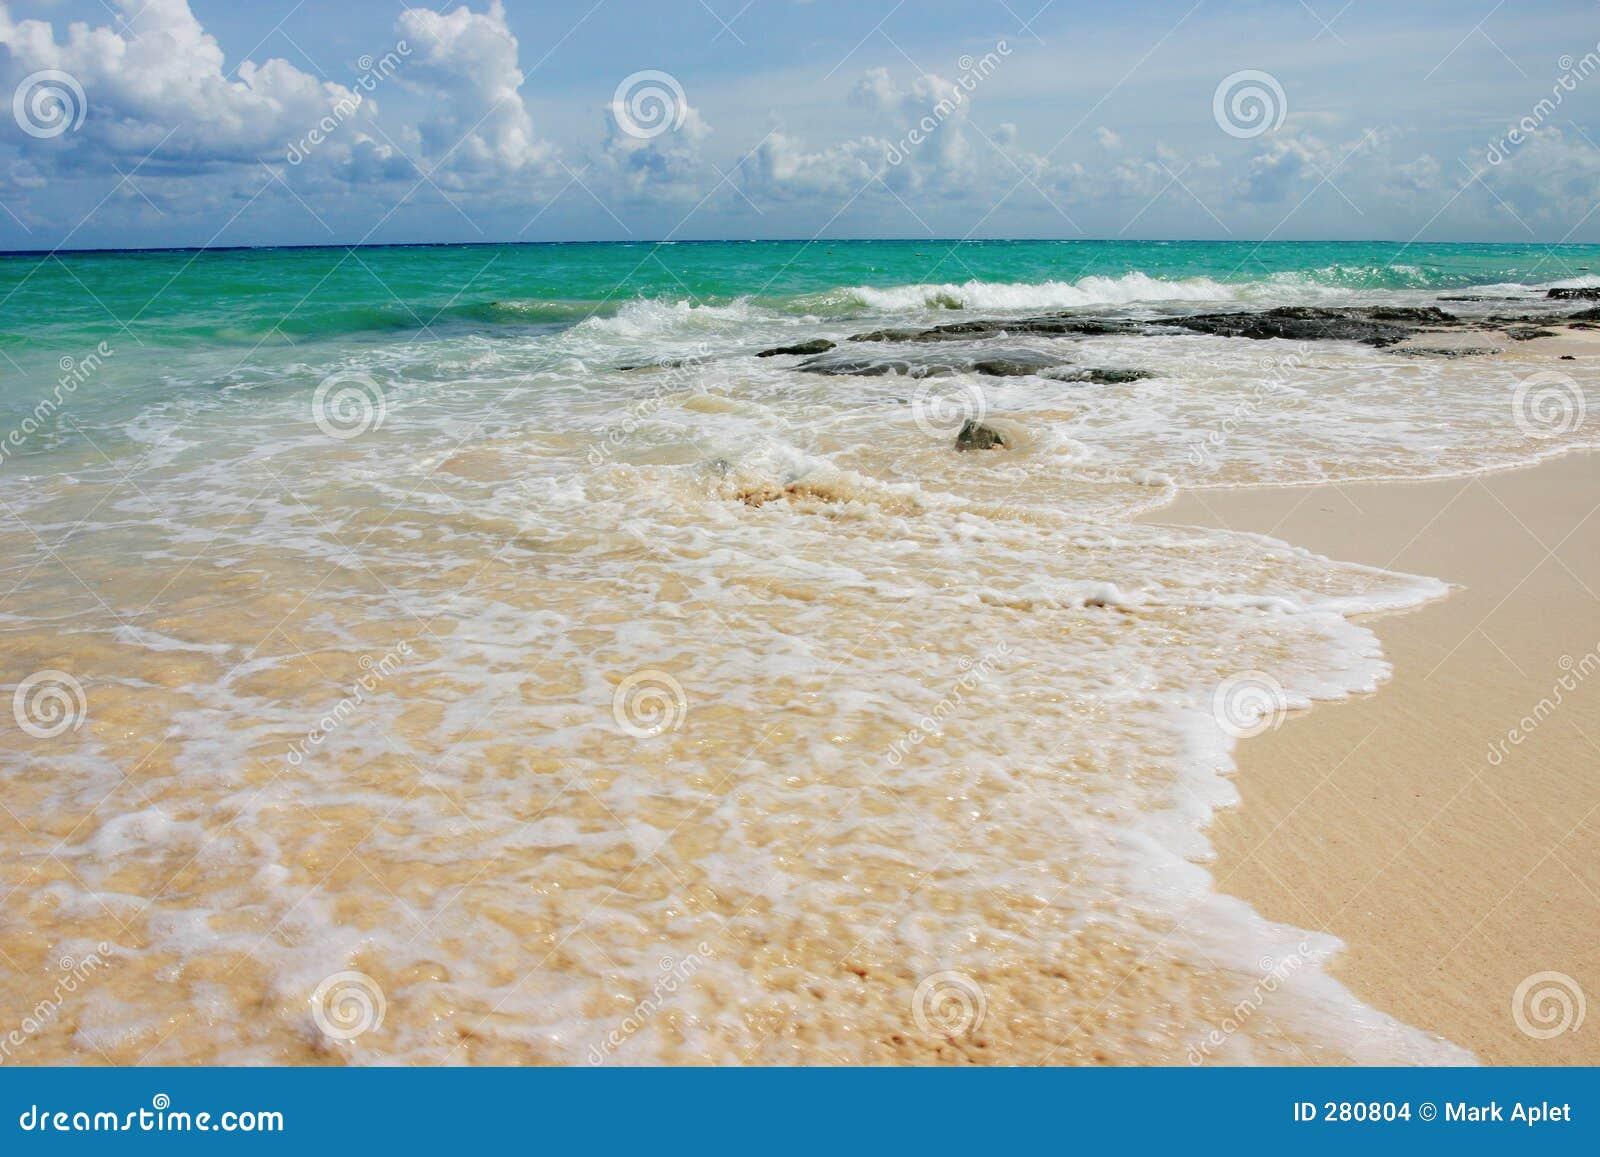 Het Strand van Mexico